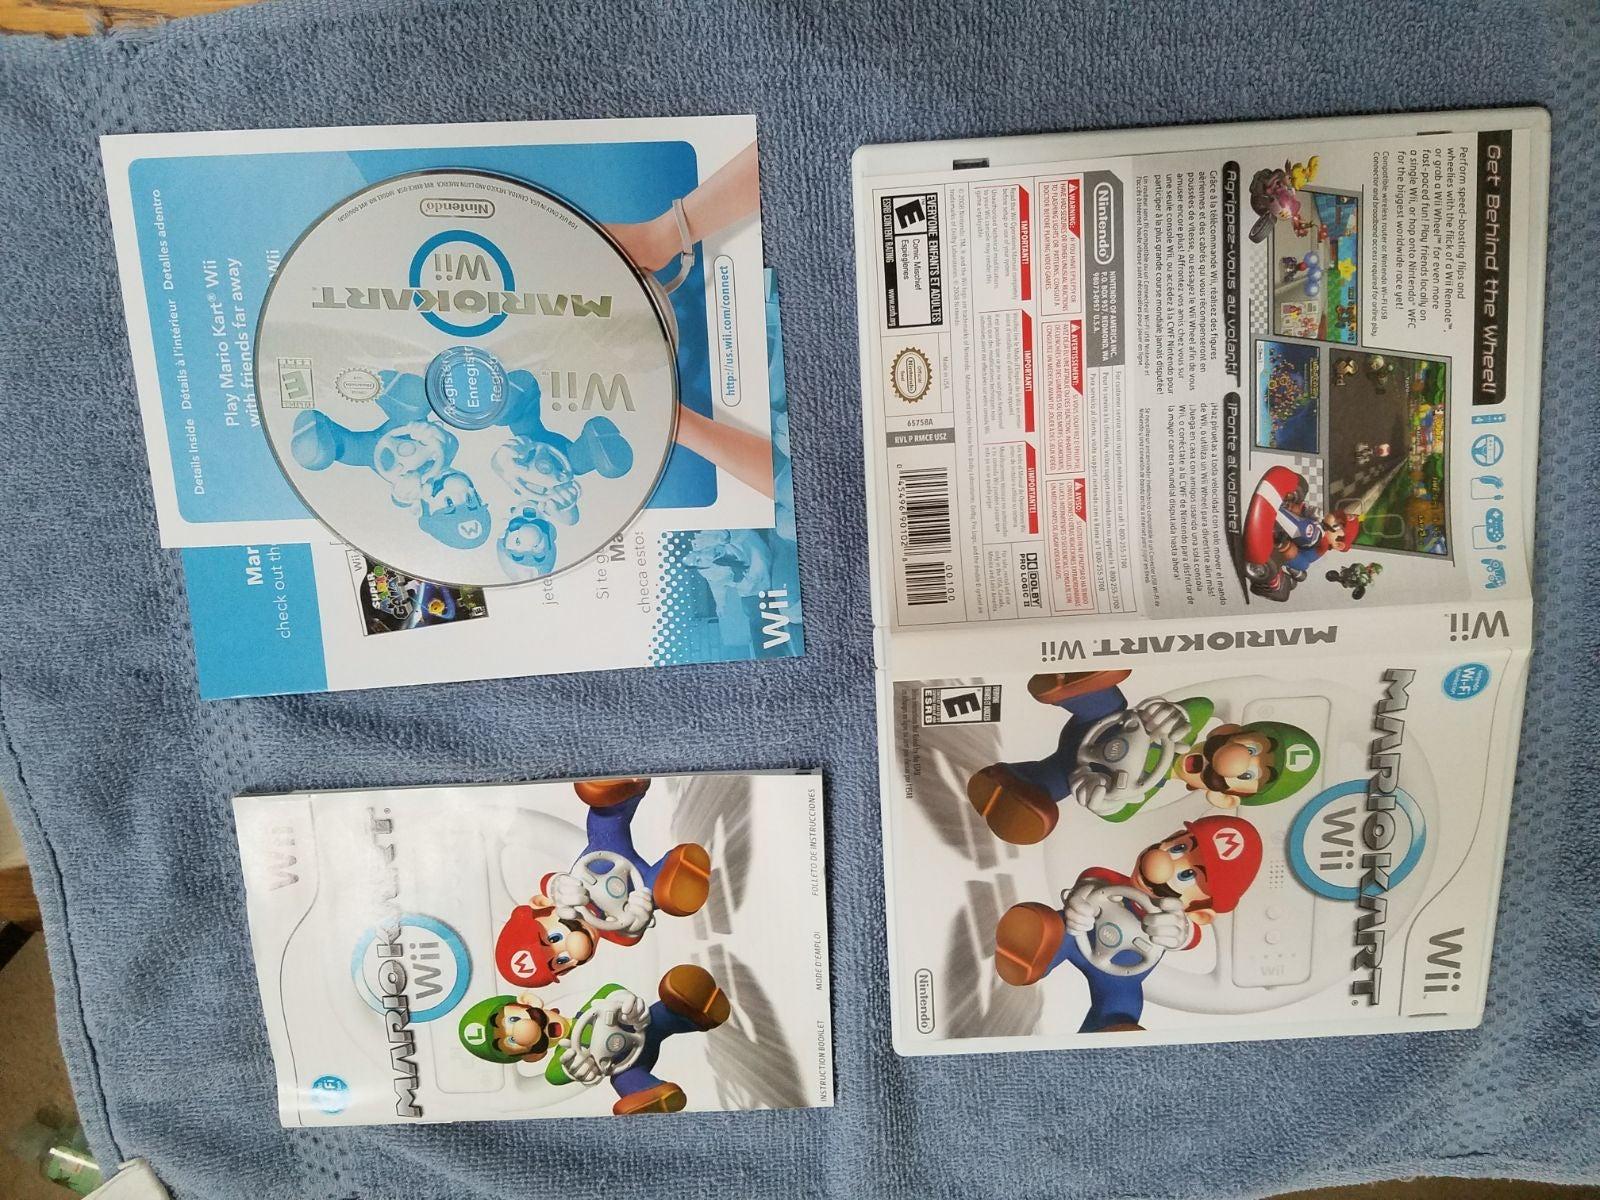 Mario Kart Wii - CIB